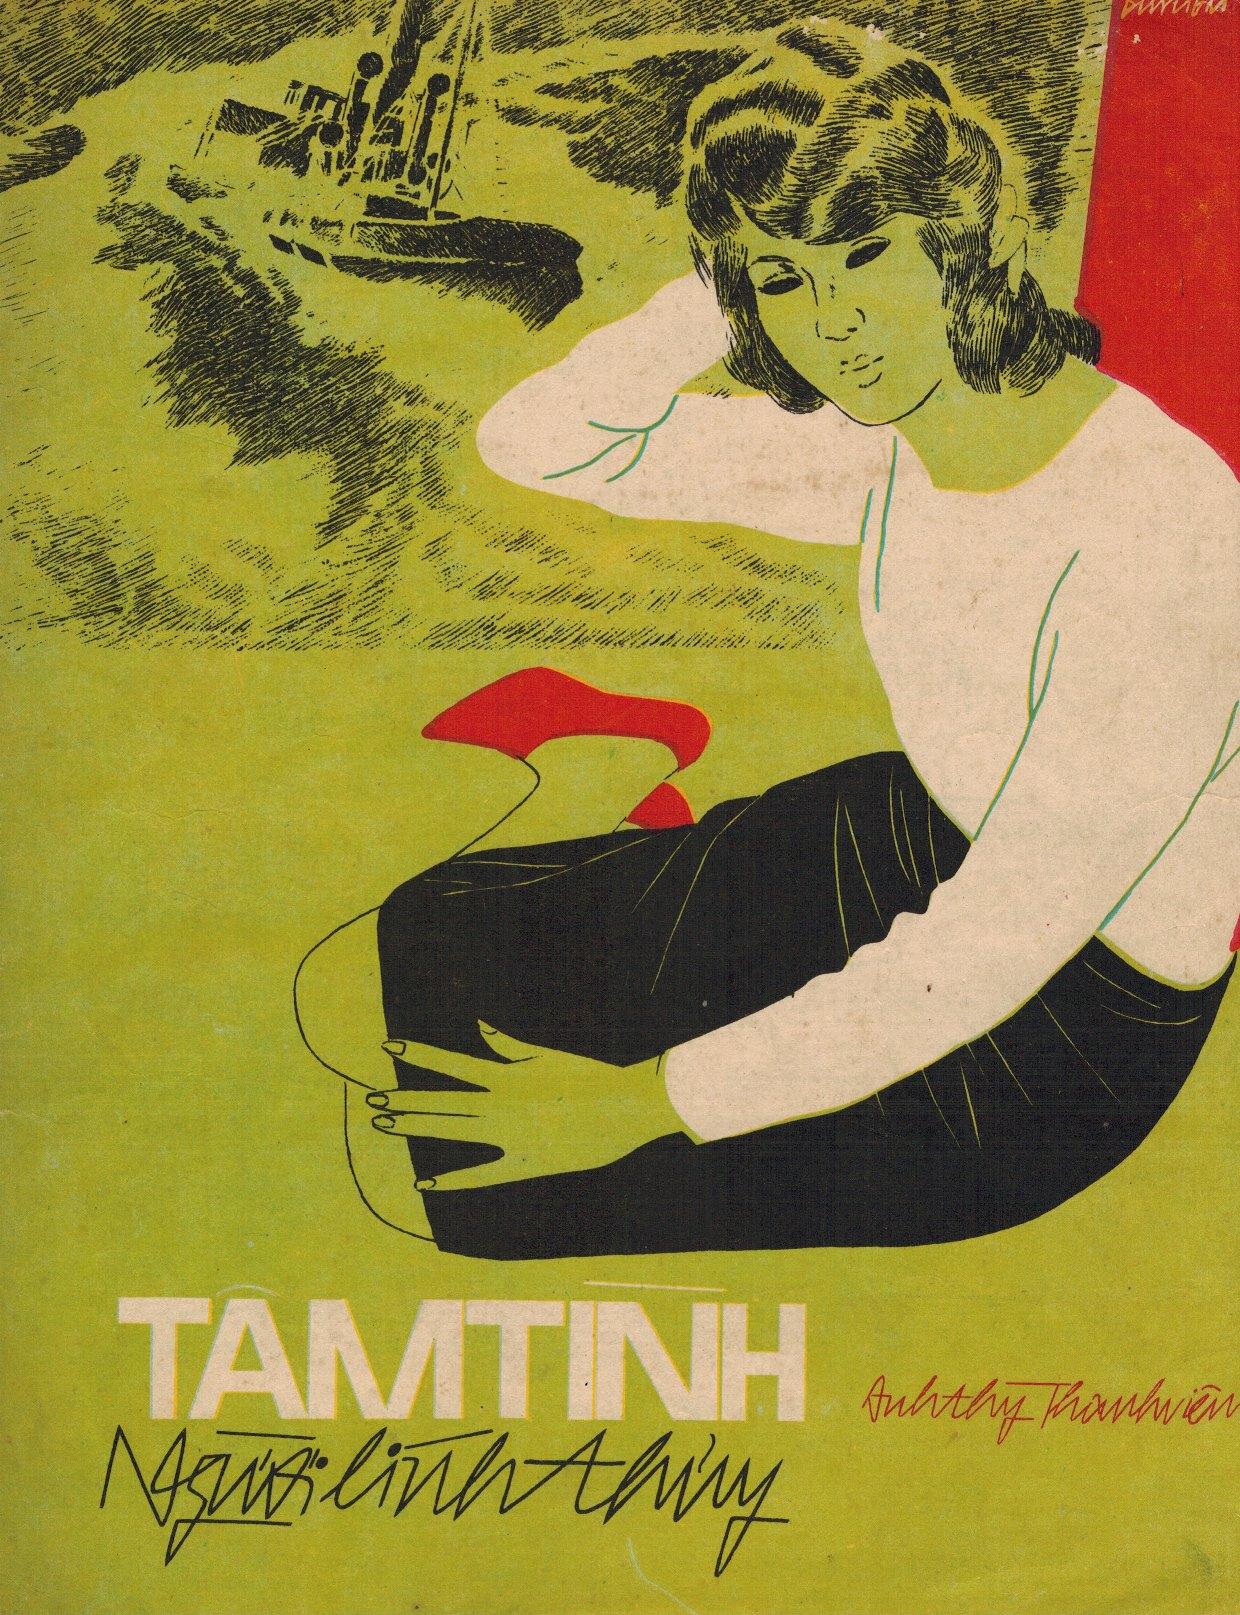 Tam-tinh-nguoi-linh-thuy-01.jpg